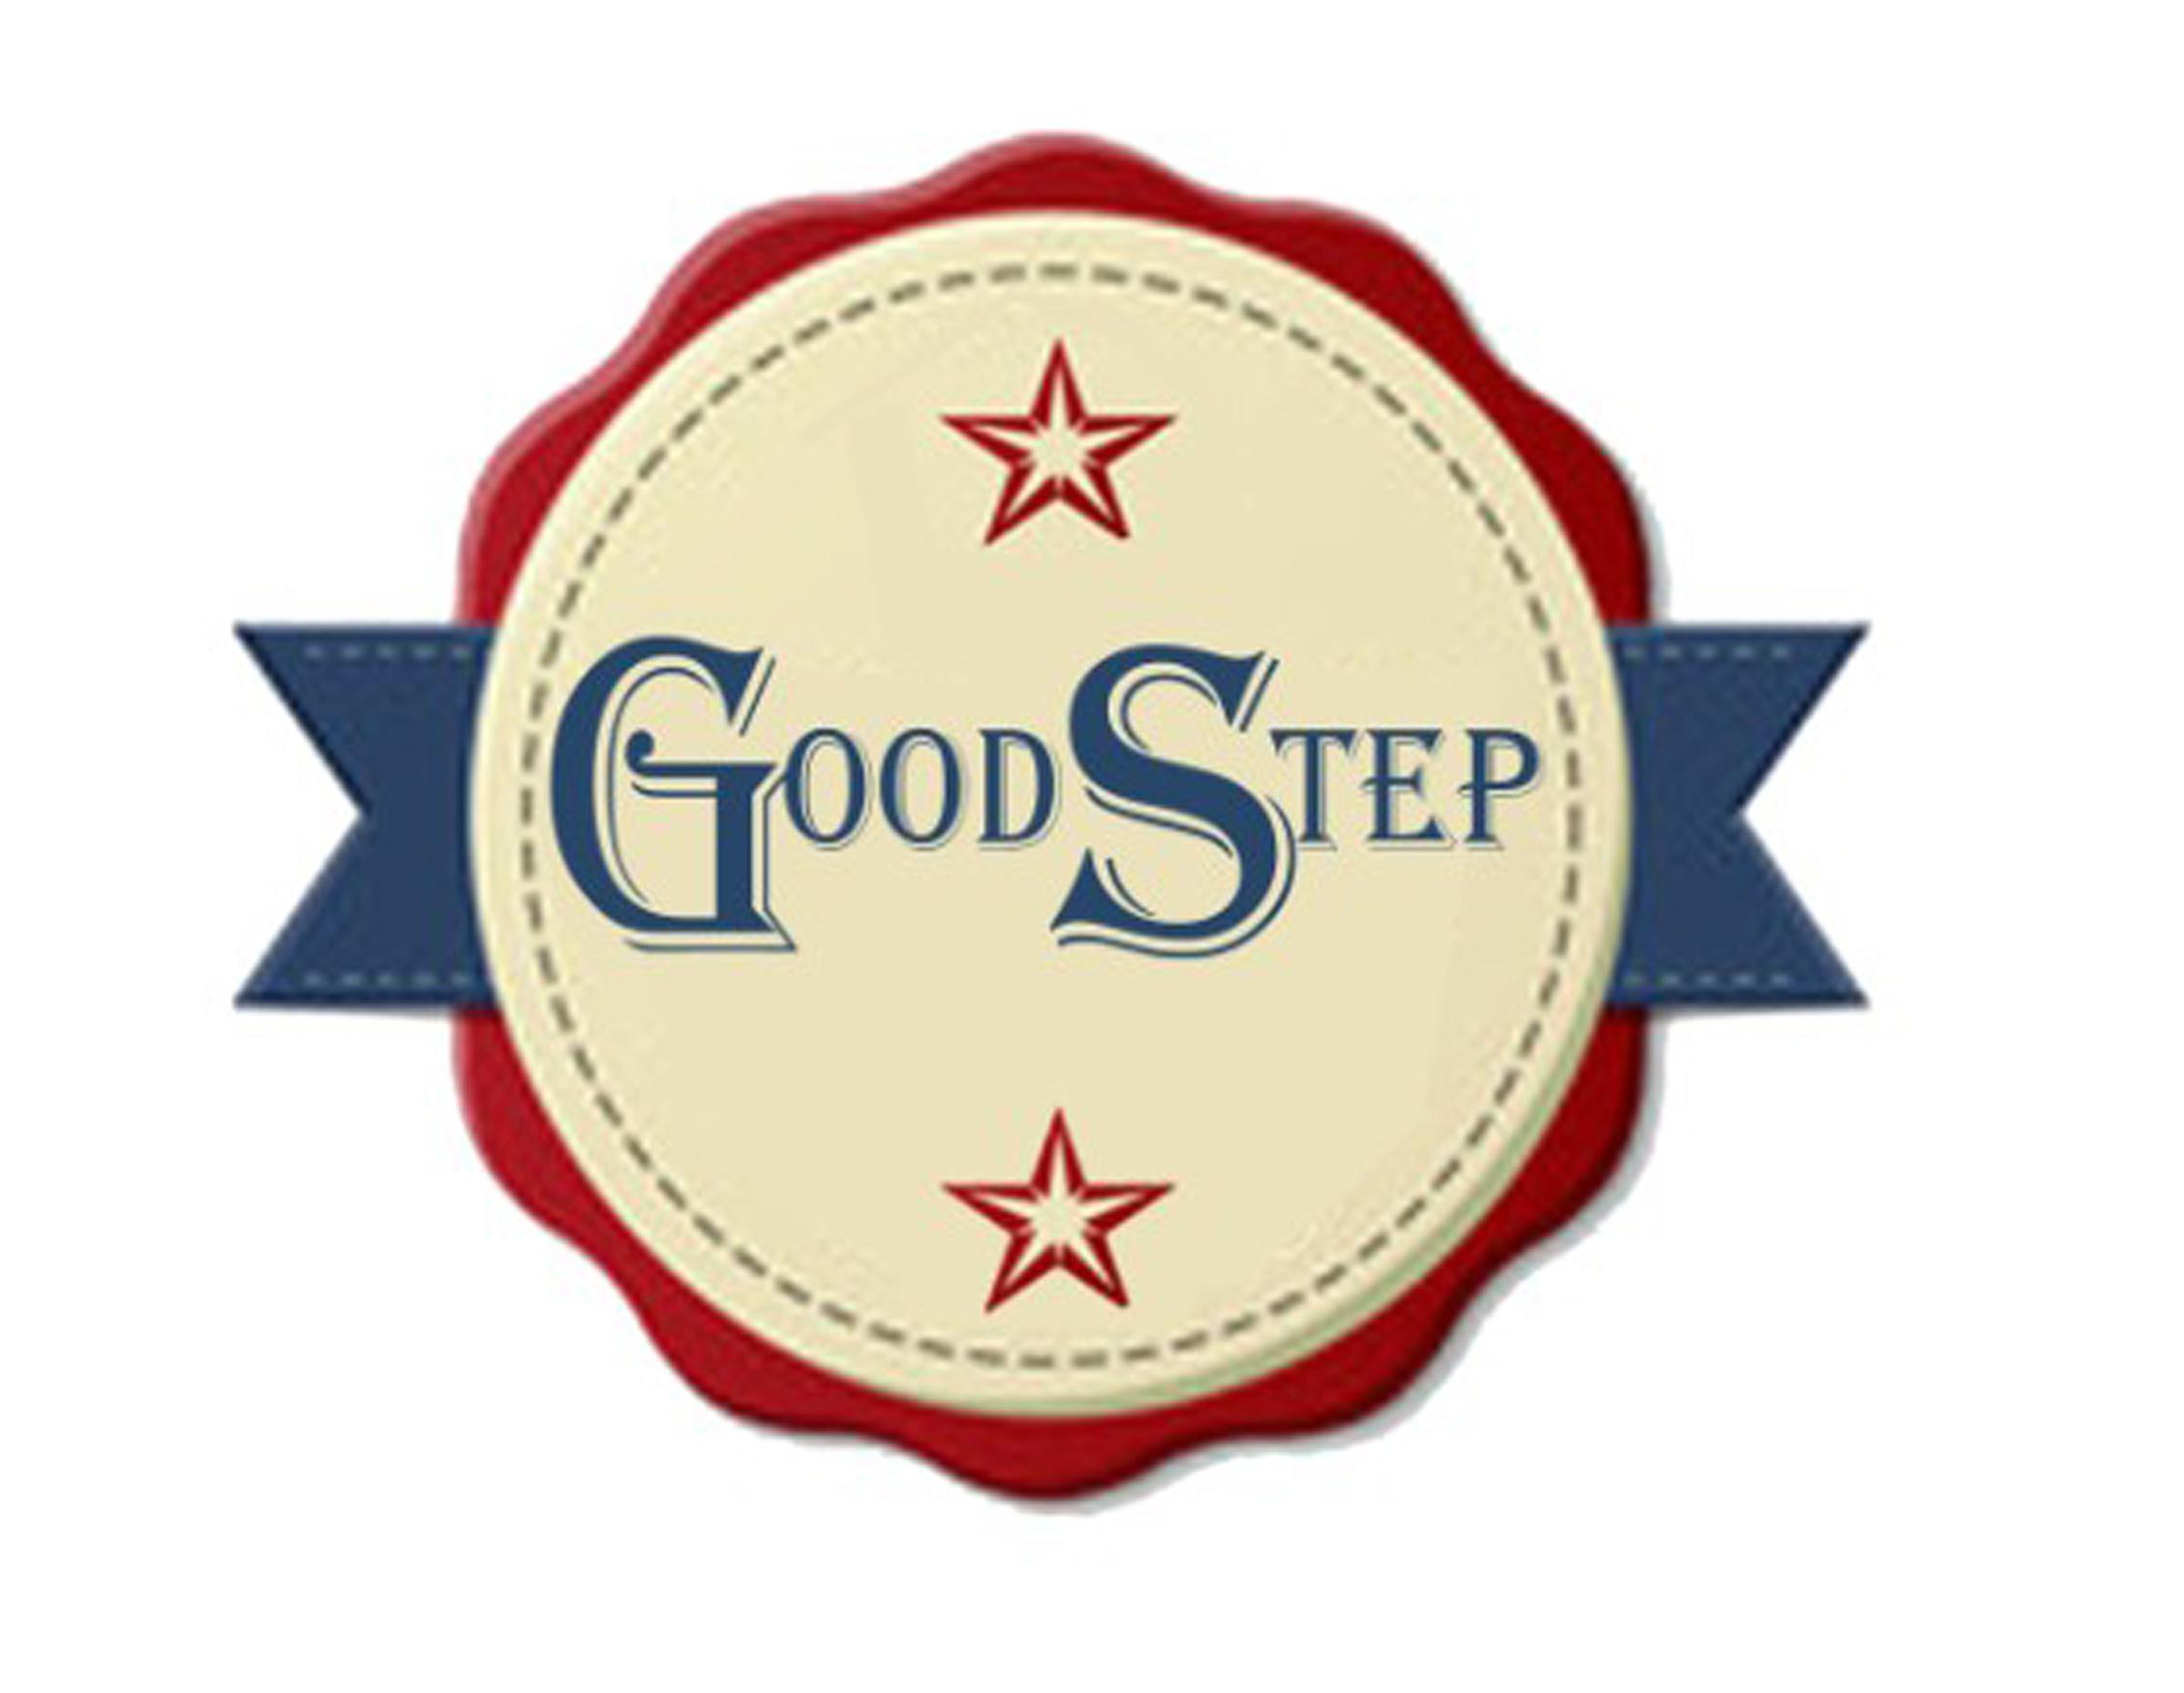 Goodstep